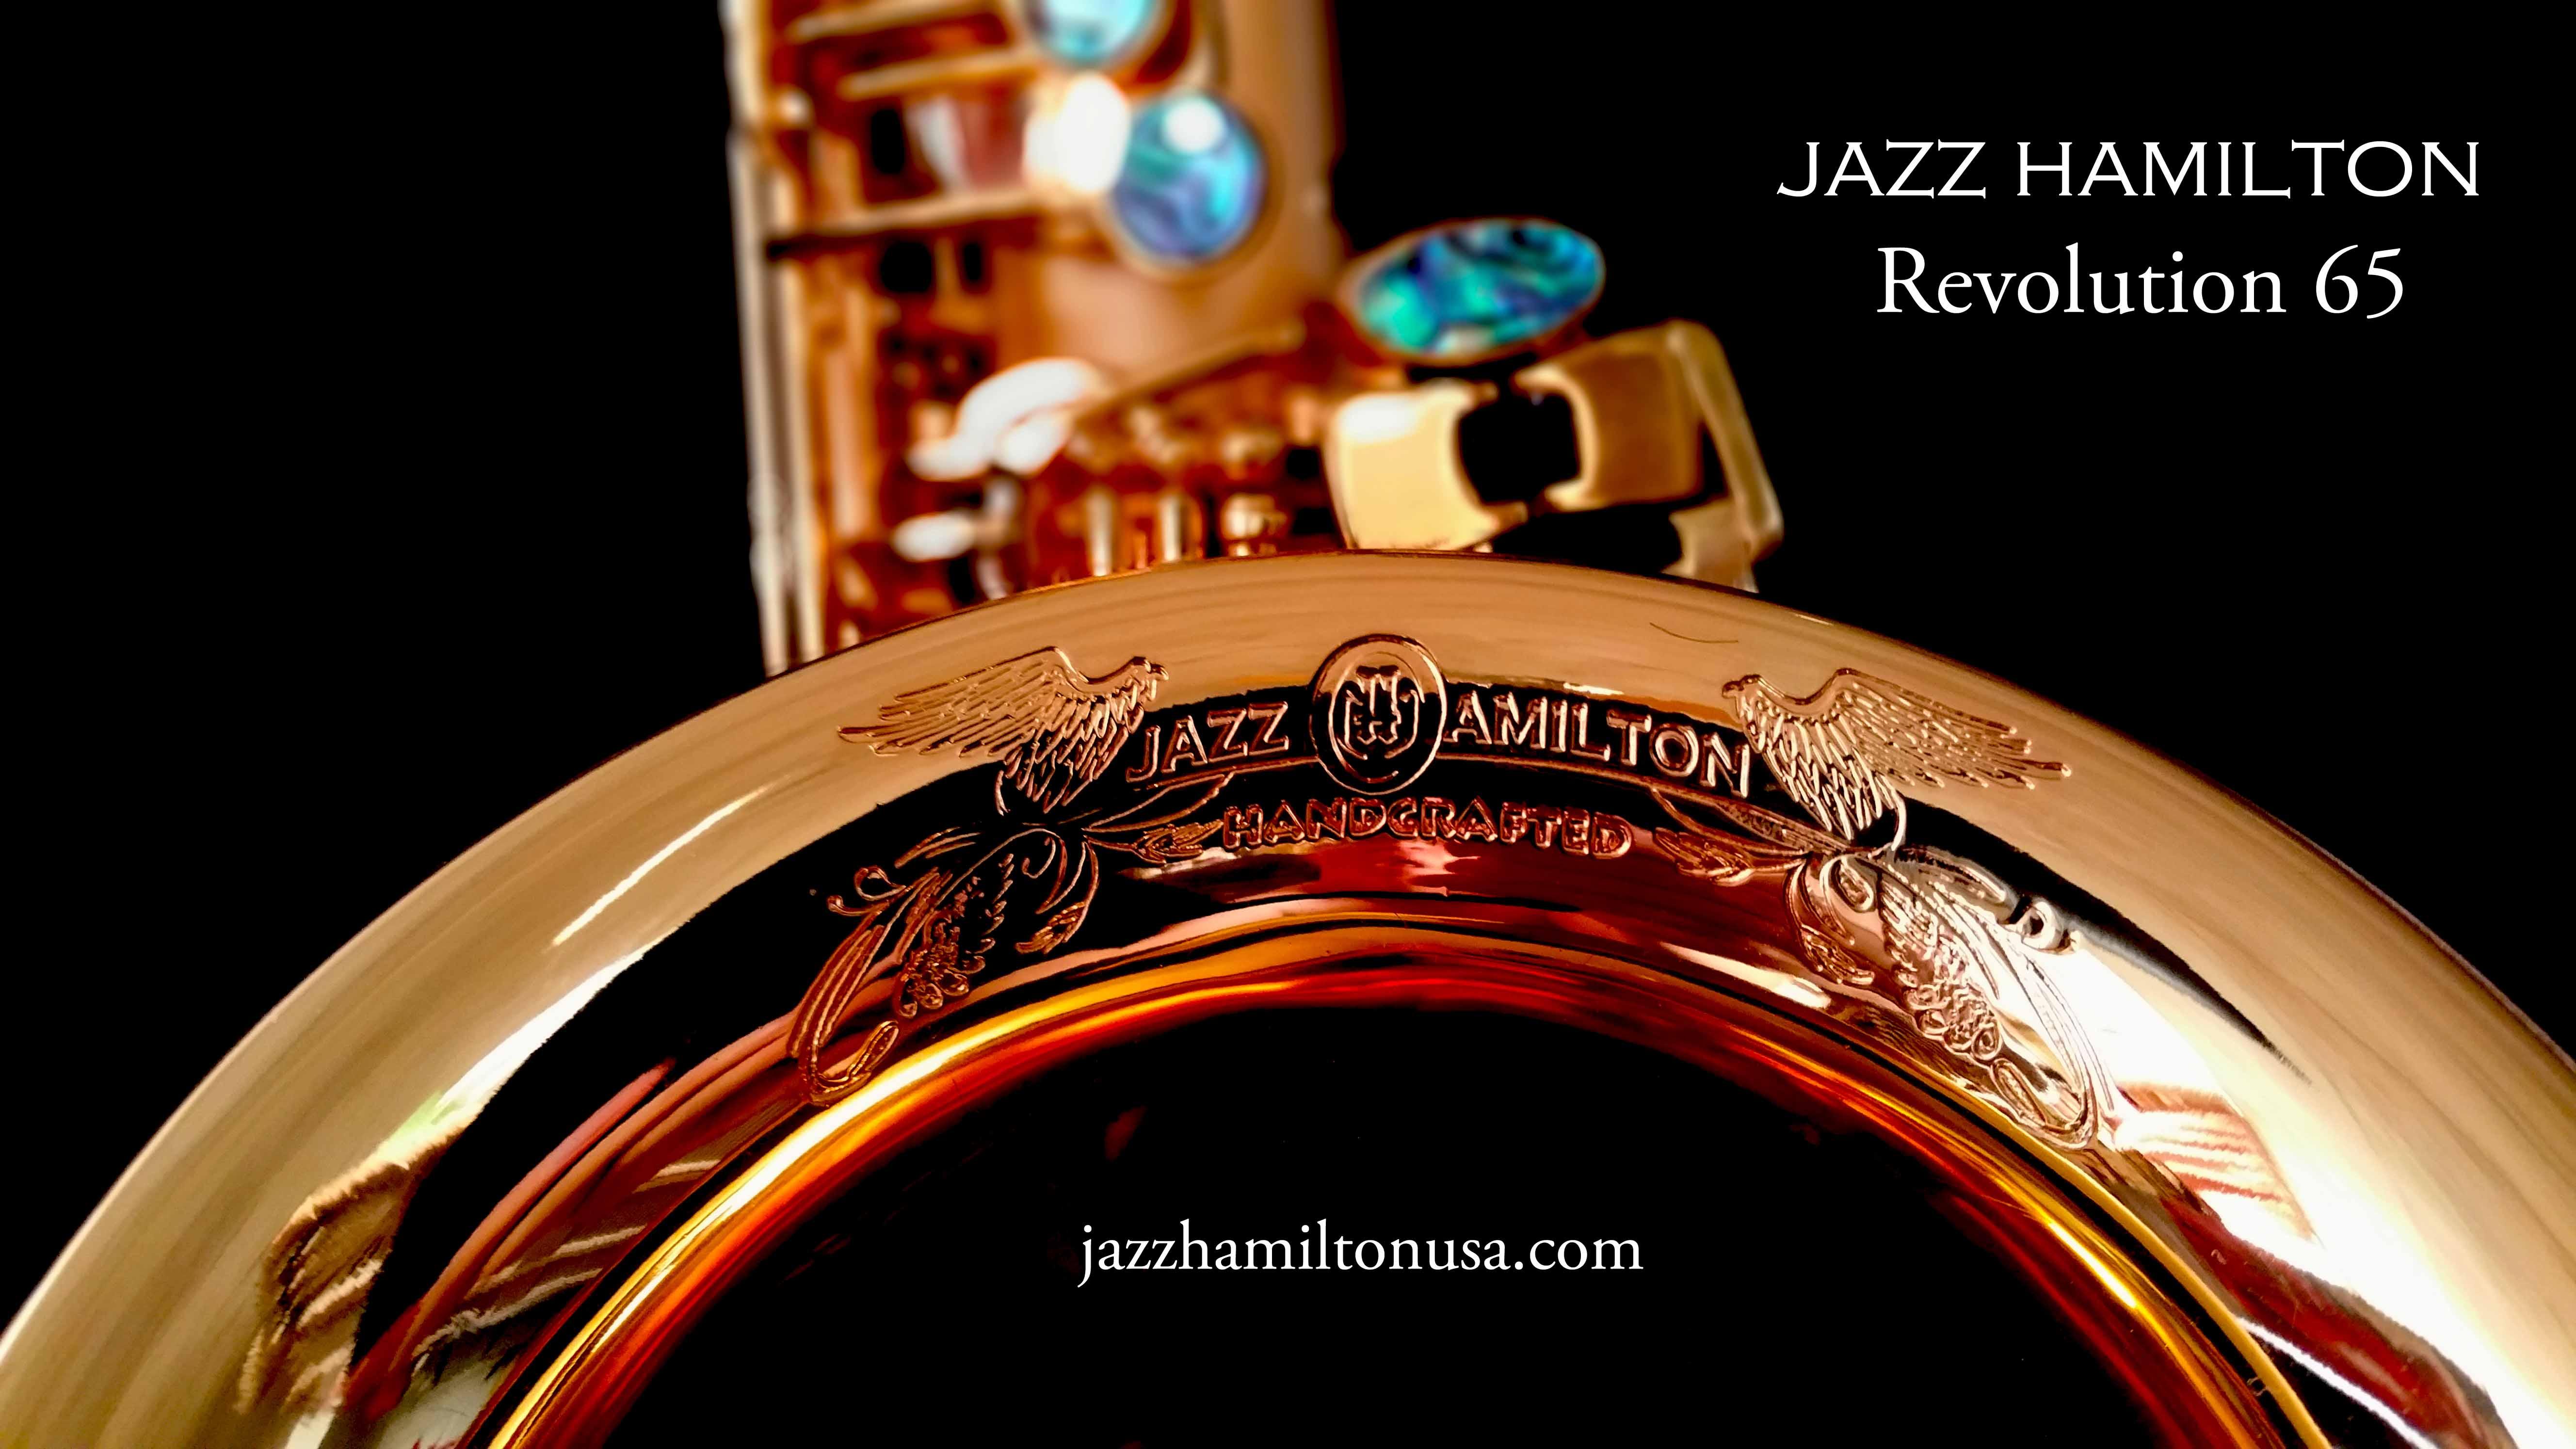 http://jazzhamiltonusa.com/wp-content/uploads/2016/08/tenor-web-1.jpg